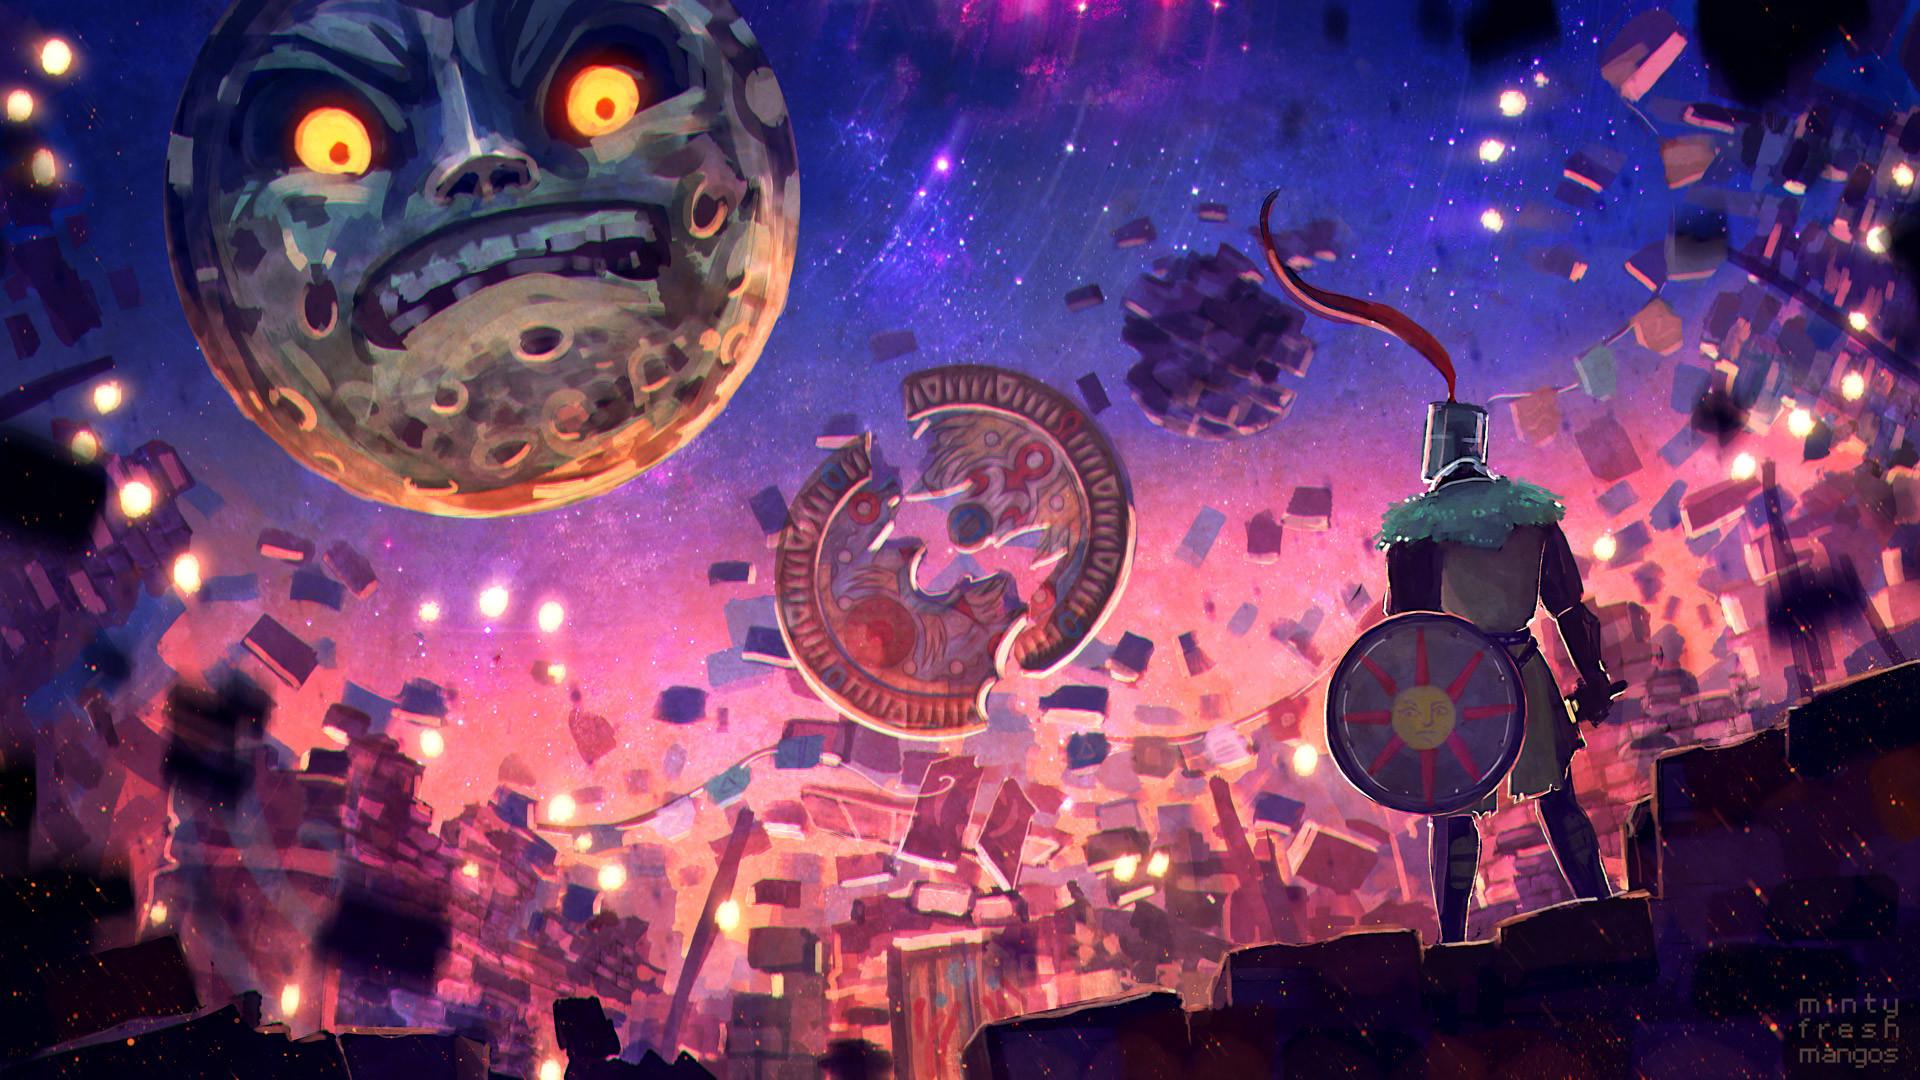 Video Game – Crossover The Legend Of Zelda: Majora's Mask Dark Souls  Solaire of Astora